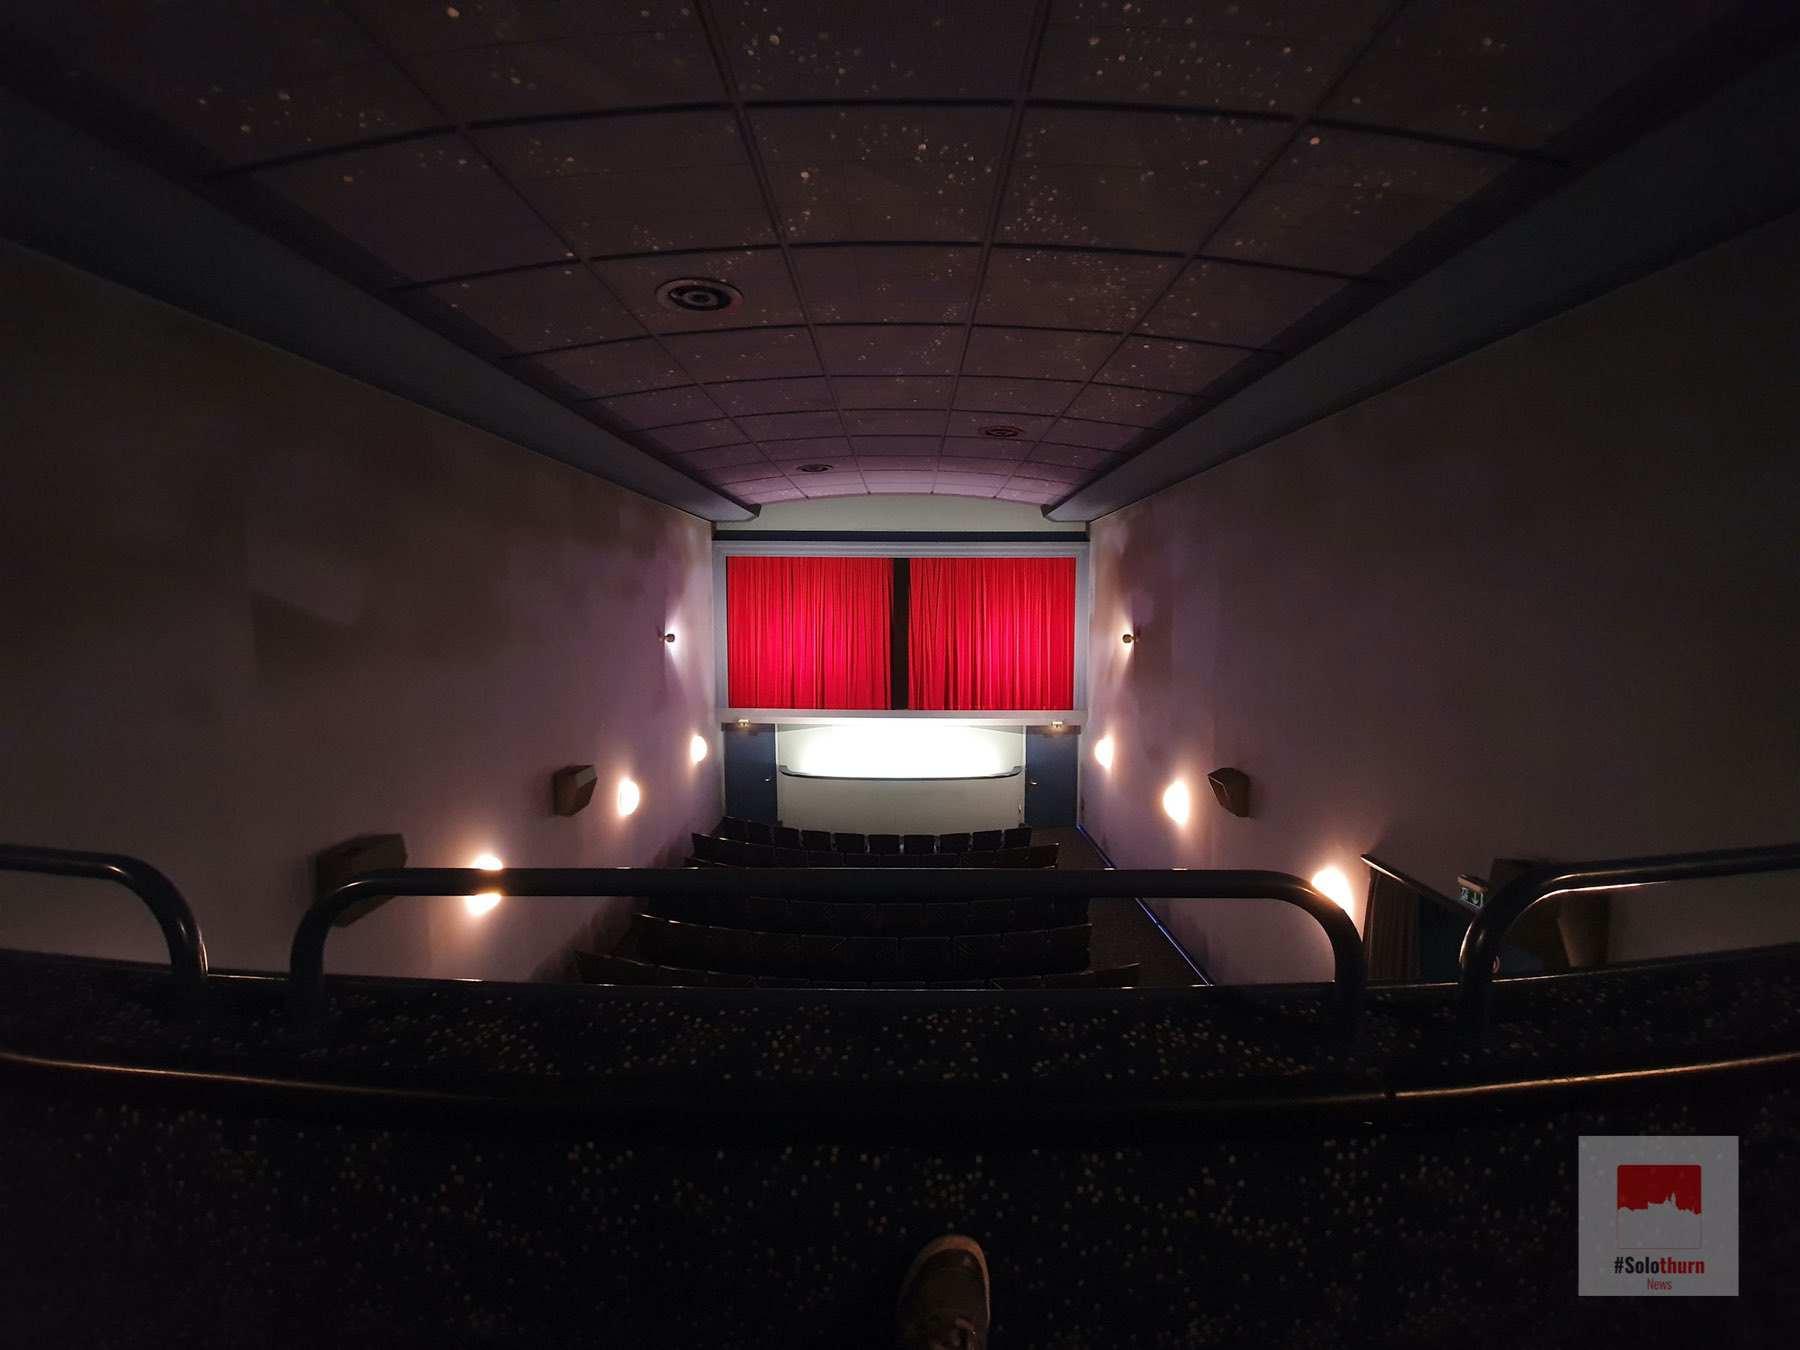 Kino Capitol Solothurn